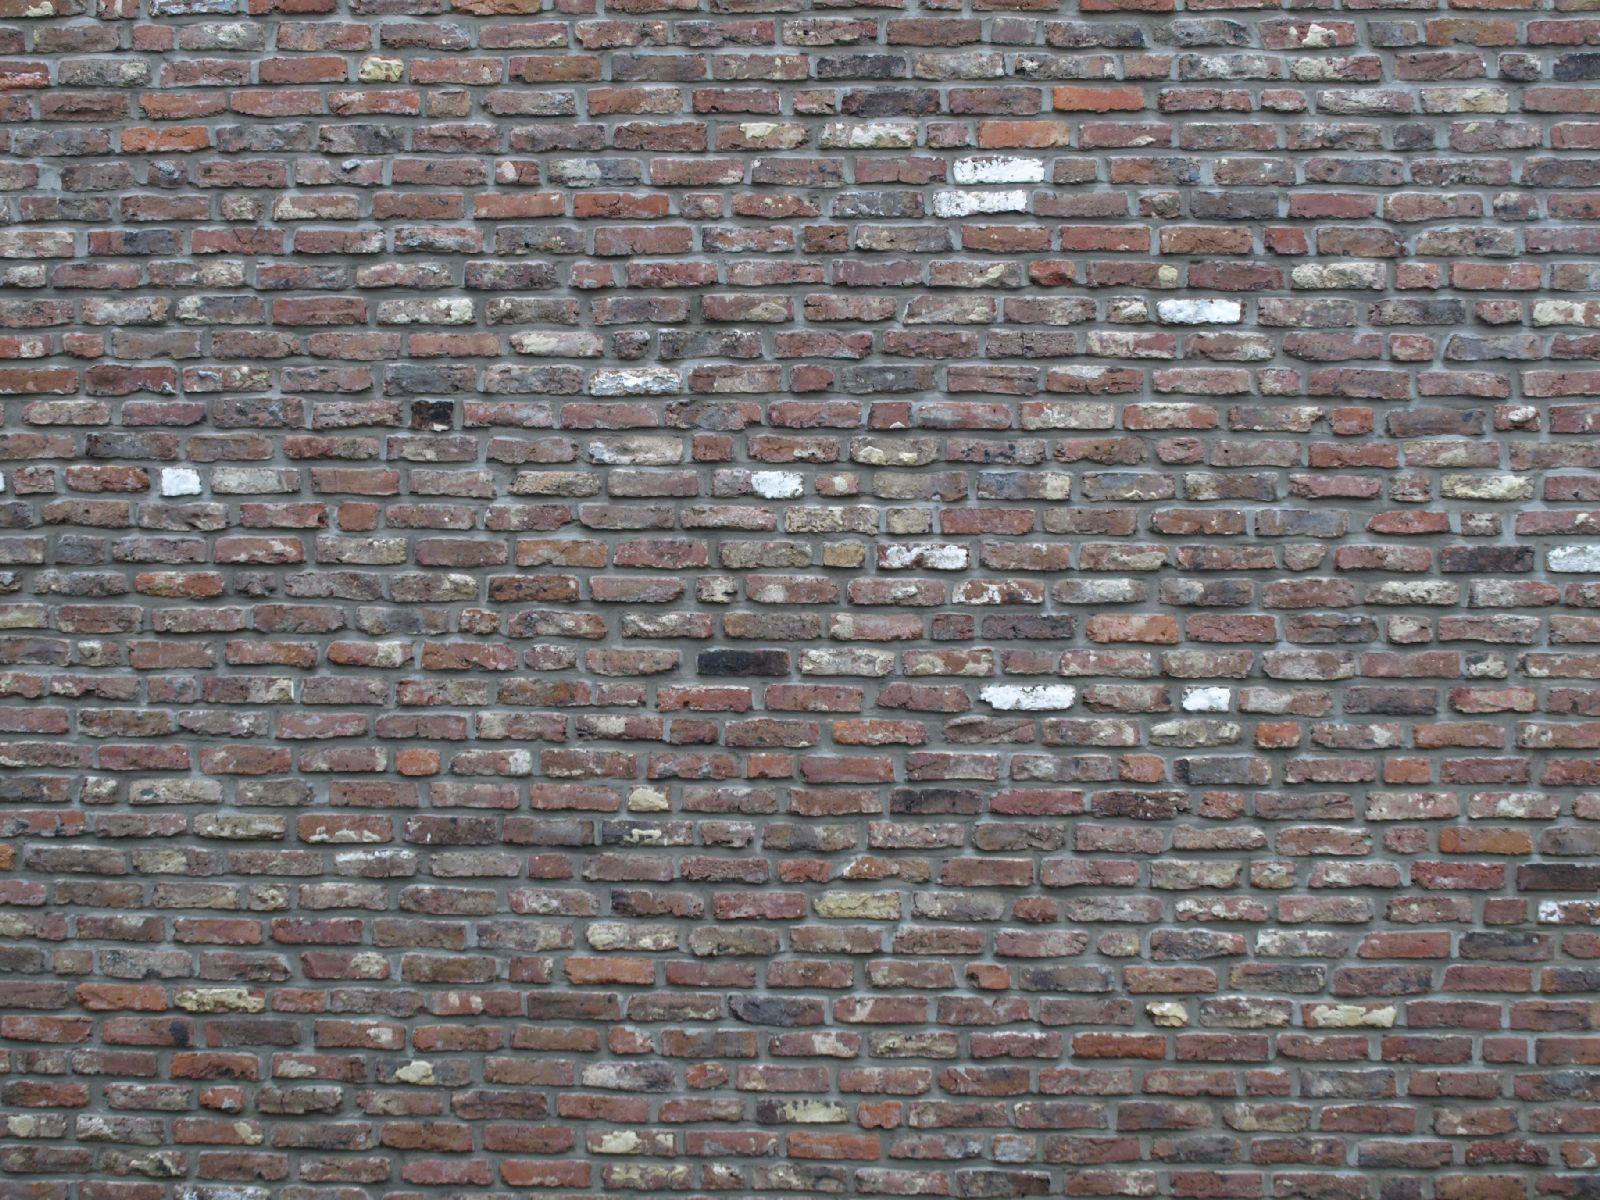 Wand-Mauerwerk-Backstein_Textur_A_P6283838